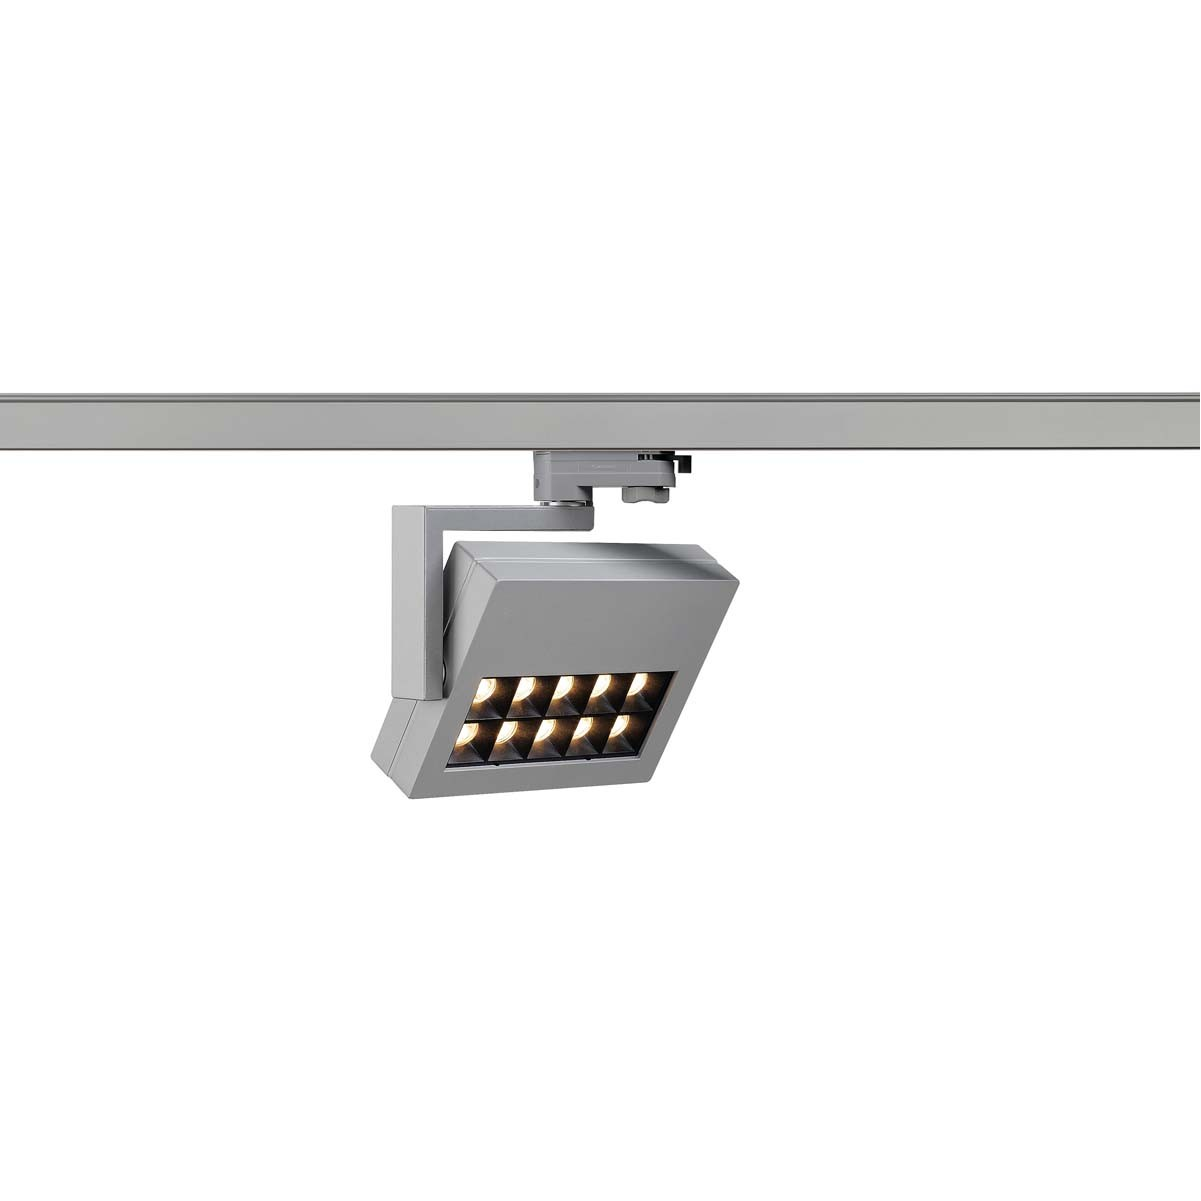 SLV 152554 Profuno LED Spot 18W 3000K Eutrac 3 Circuit Track Light Silver Grey